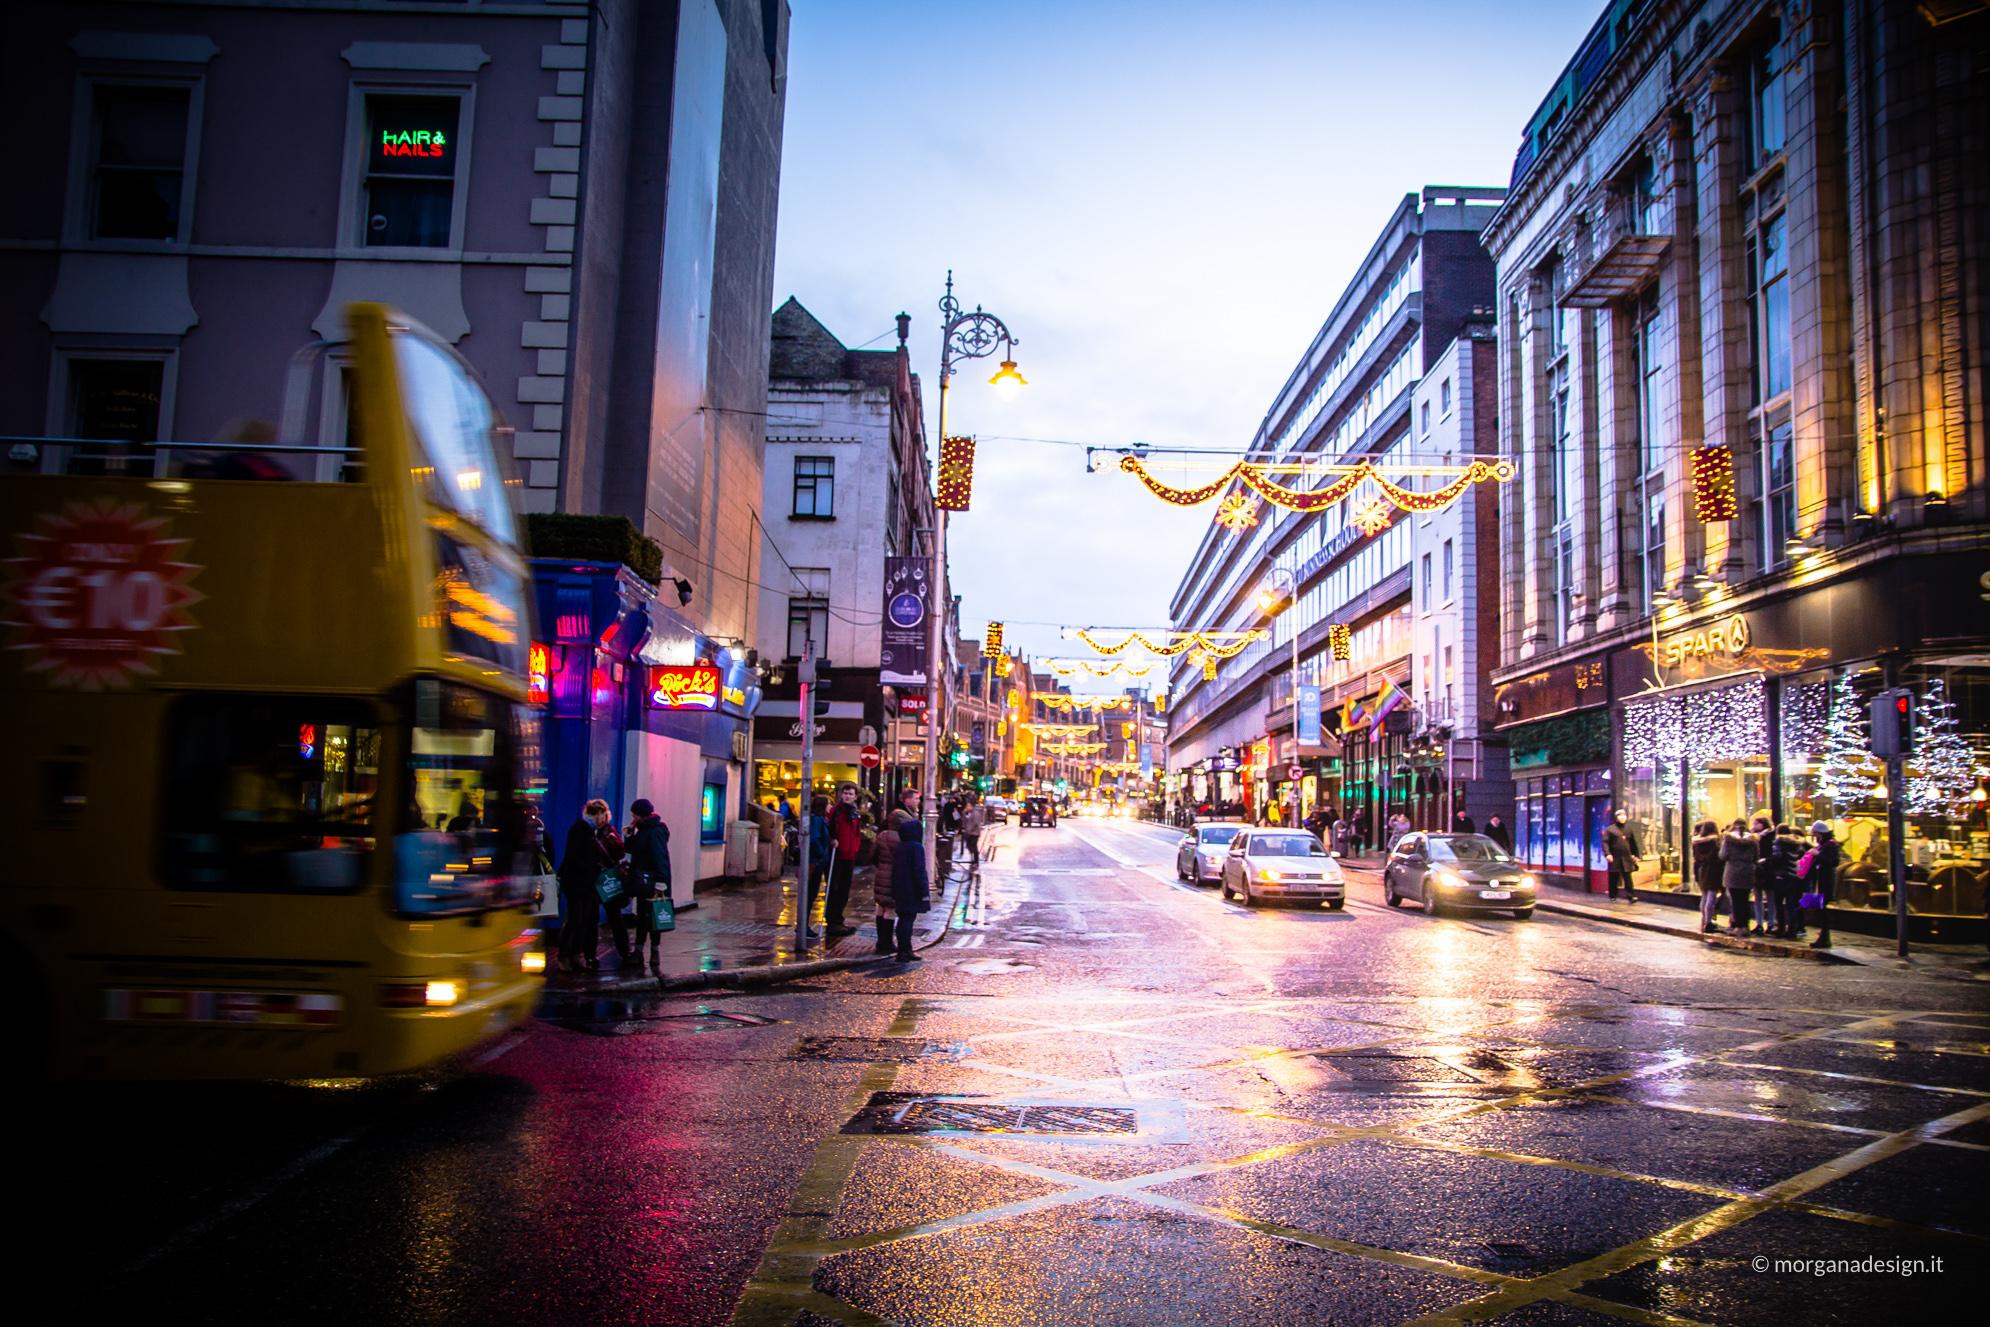 prima volta a dublino - morganadesign - Dublin streets